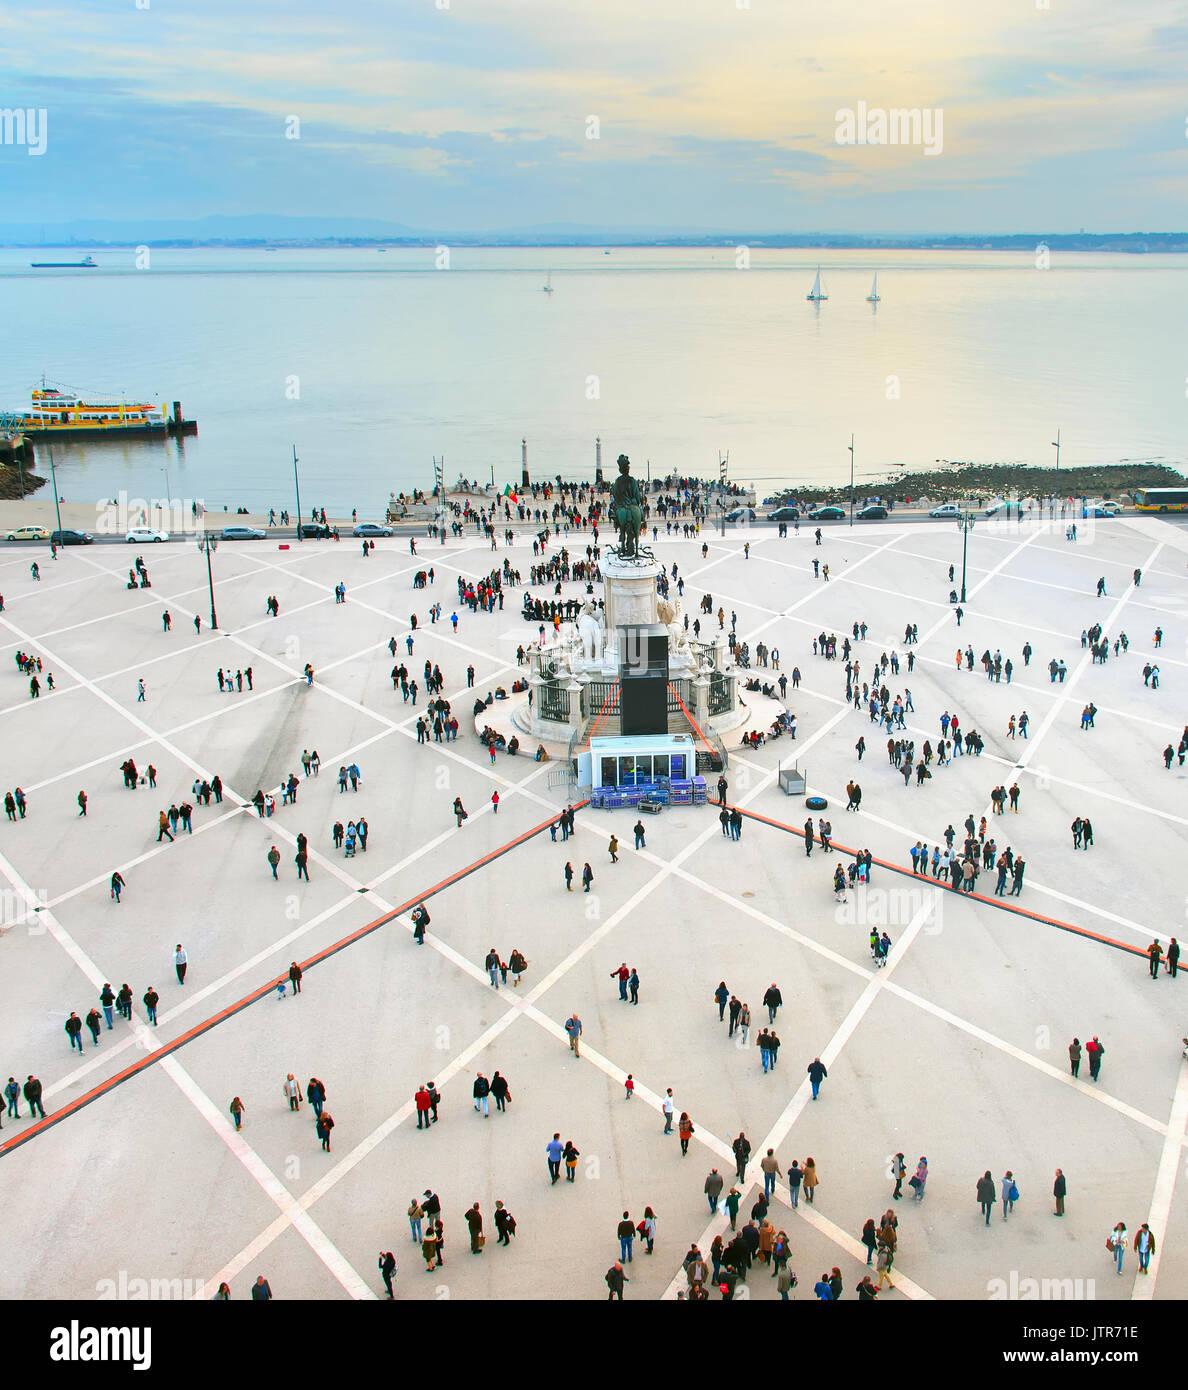 Luftaufnahme des kommerziellen Platz. Lissabon, Portugal Stockbild